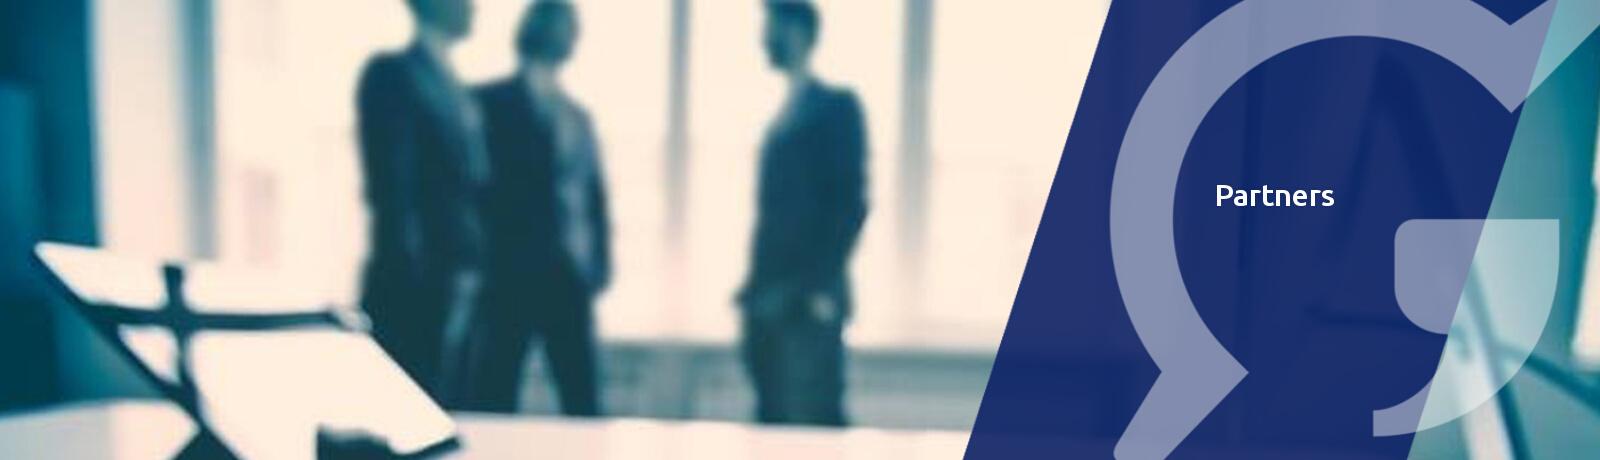 Partners Header Image